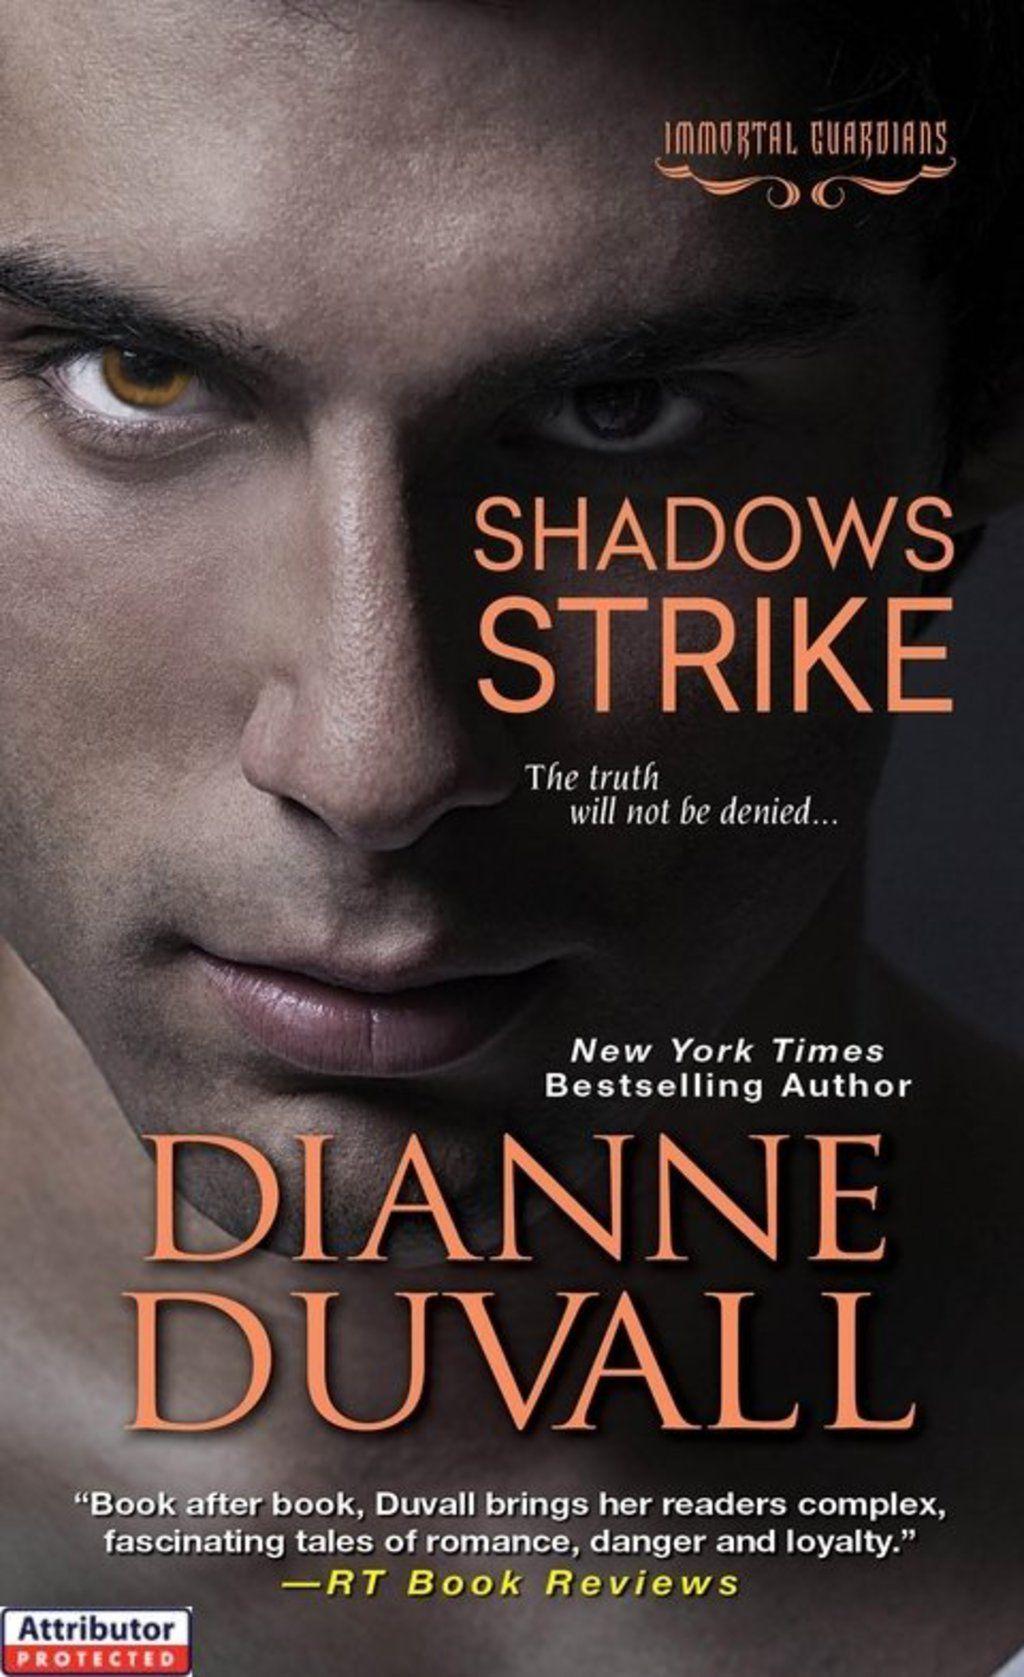 Shadows Strike Ebook Bargain Books Duvall Paranormal Romance